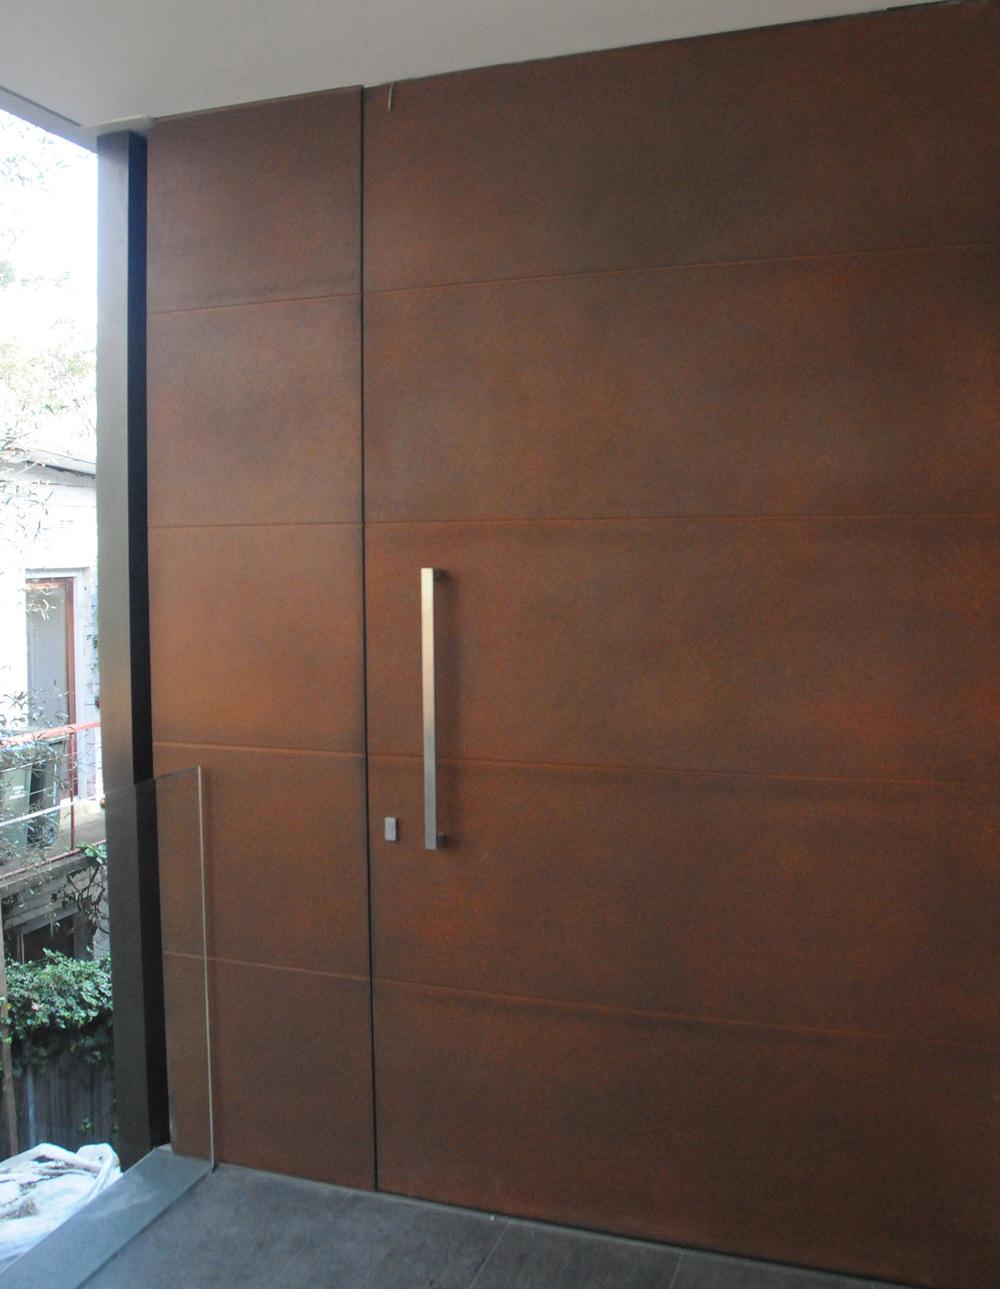 Image Number 5 Of Rusted Steel Doors & Rusty Steel Doors \u0026 Image Number 5 Of Rusted Steel Doors